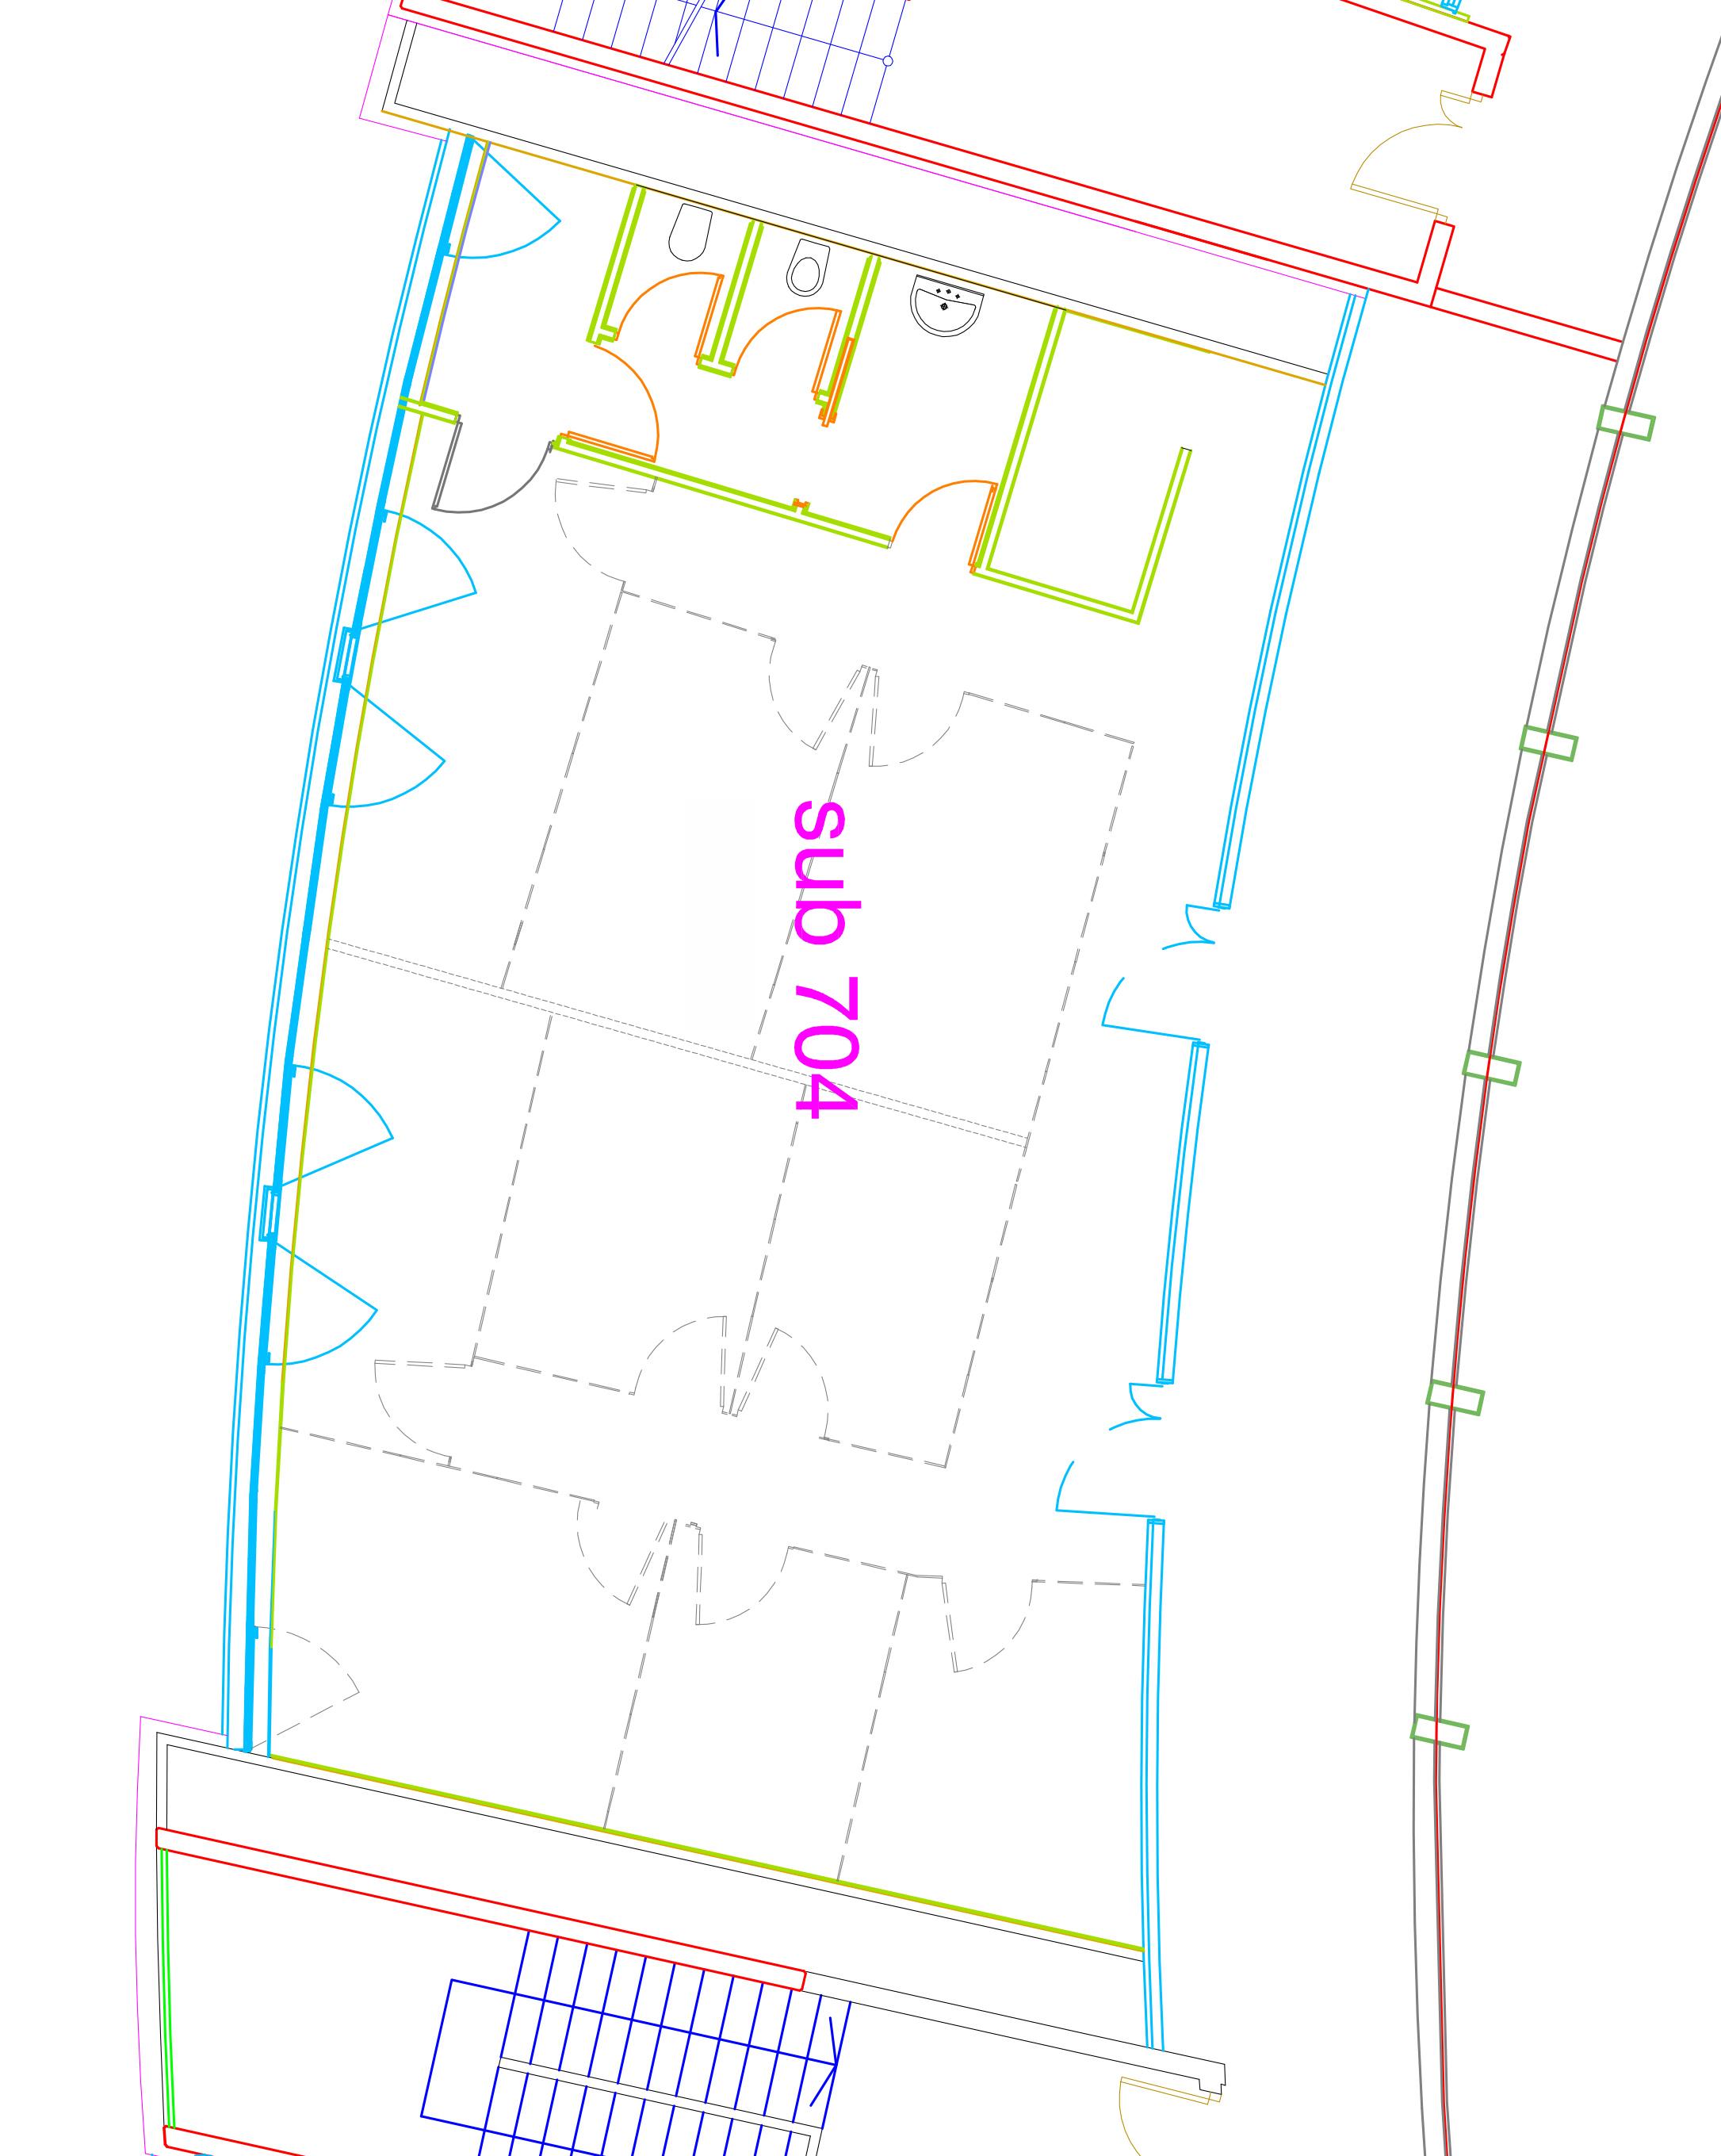 planimetrie/OB5ODL7zlc.jpg